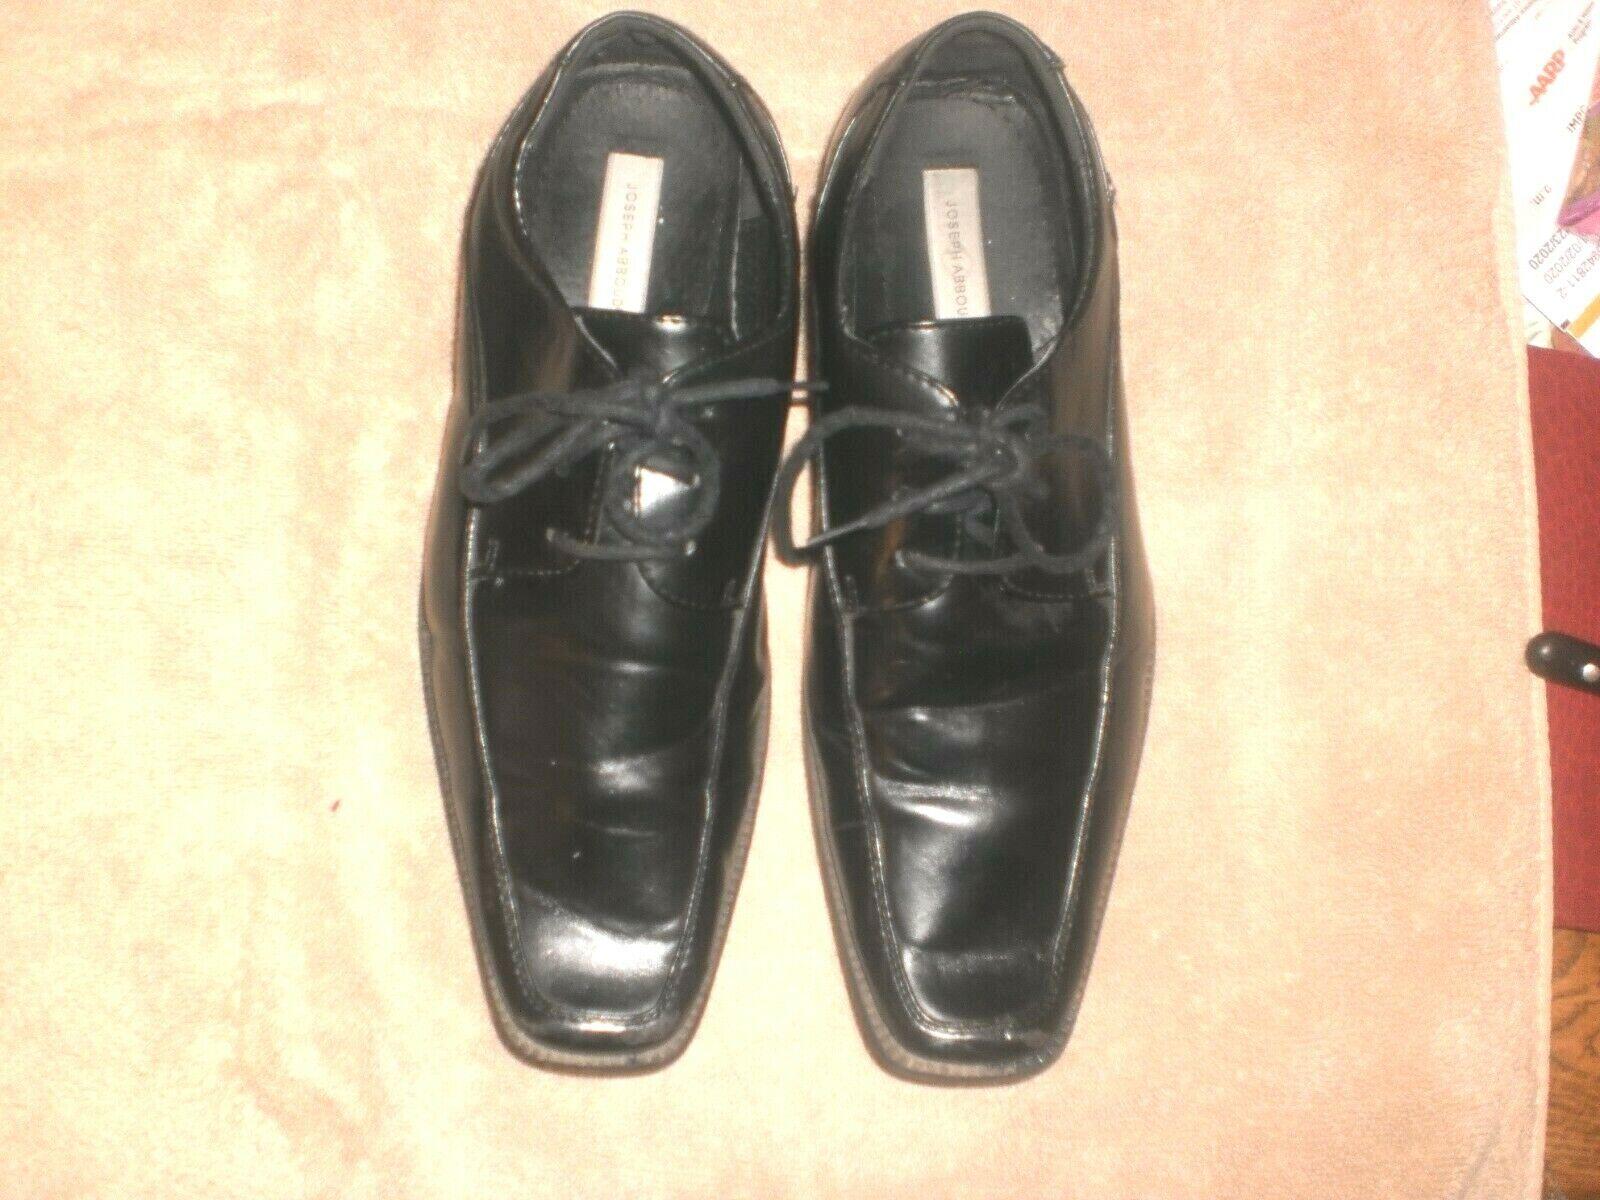 Mens/teen Joseph Abboud Black Dress Shoes Sz 8 1/2 M Leather lining